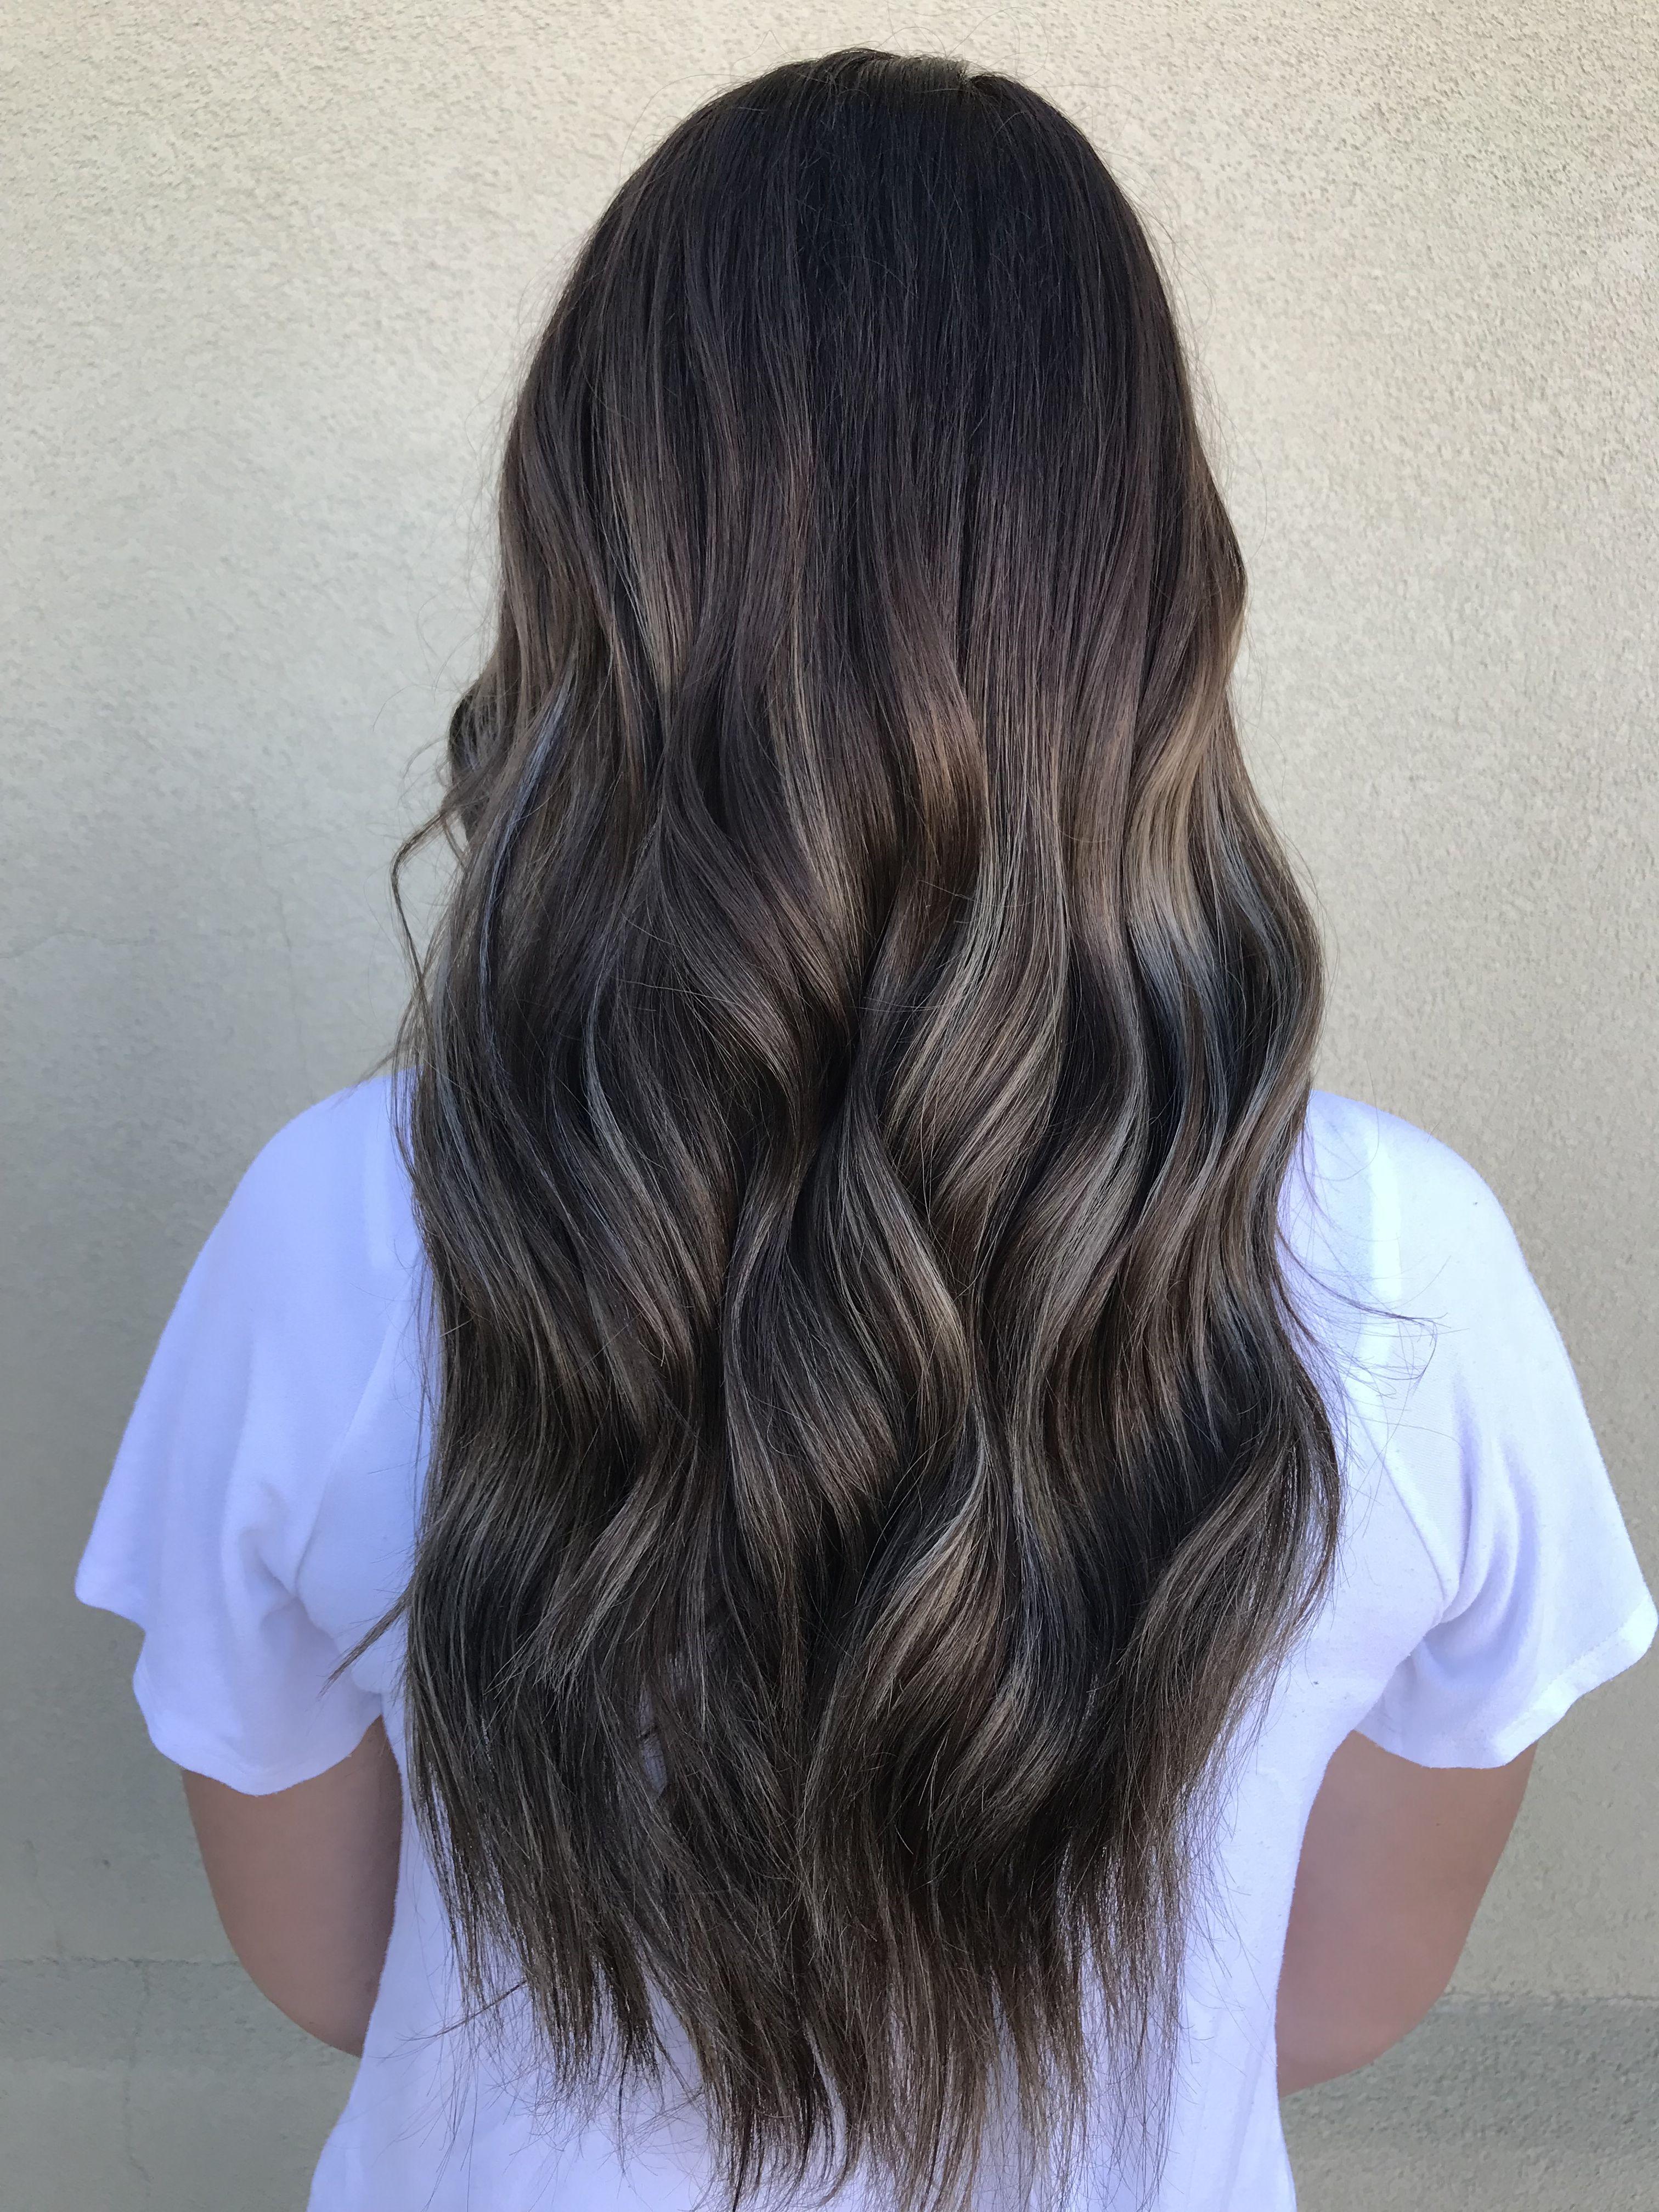 Dark Brown Into Ashy Balayage Hair By Bracail Dark Brown Hair Balayage Brown Hair Balayage Black Hair Balayage